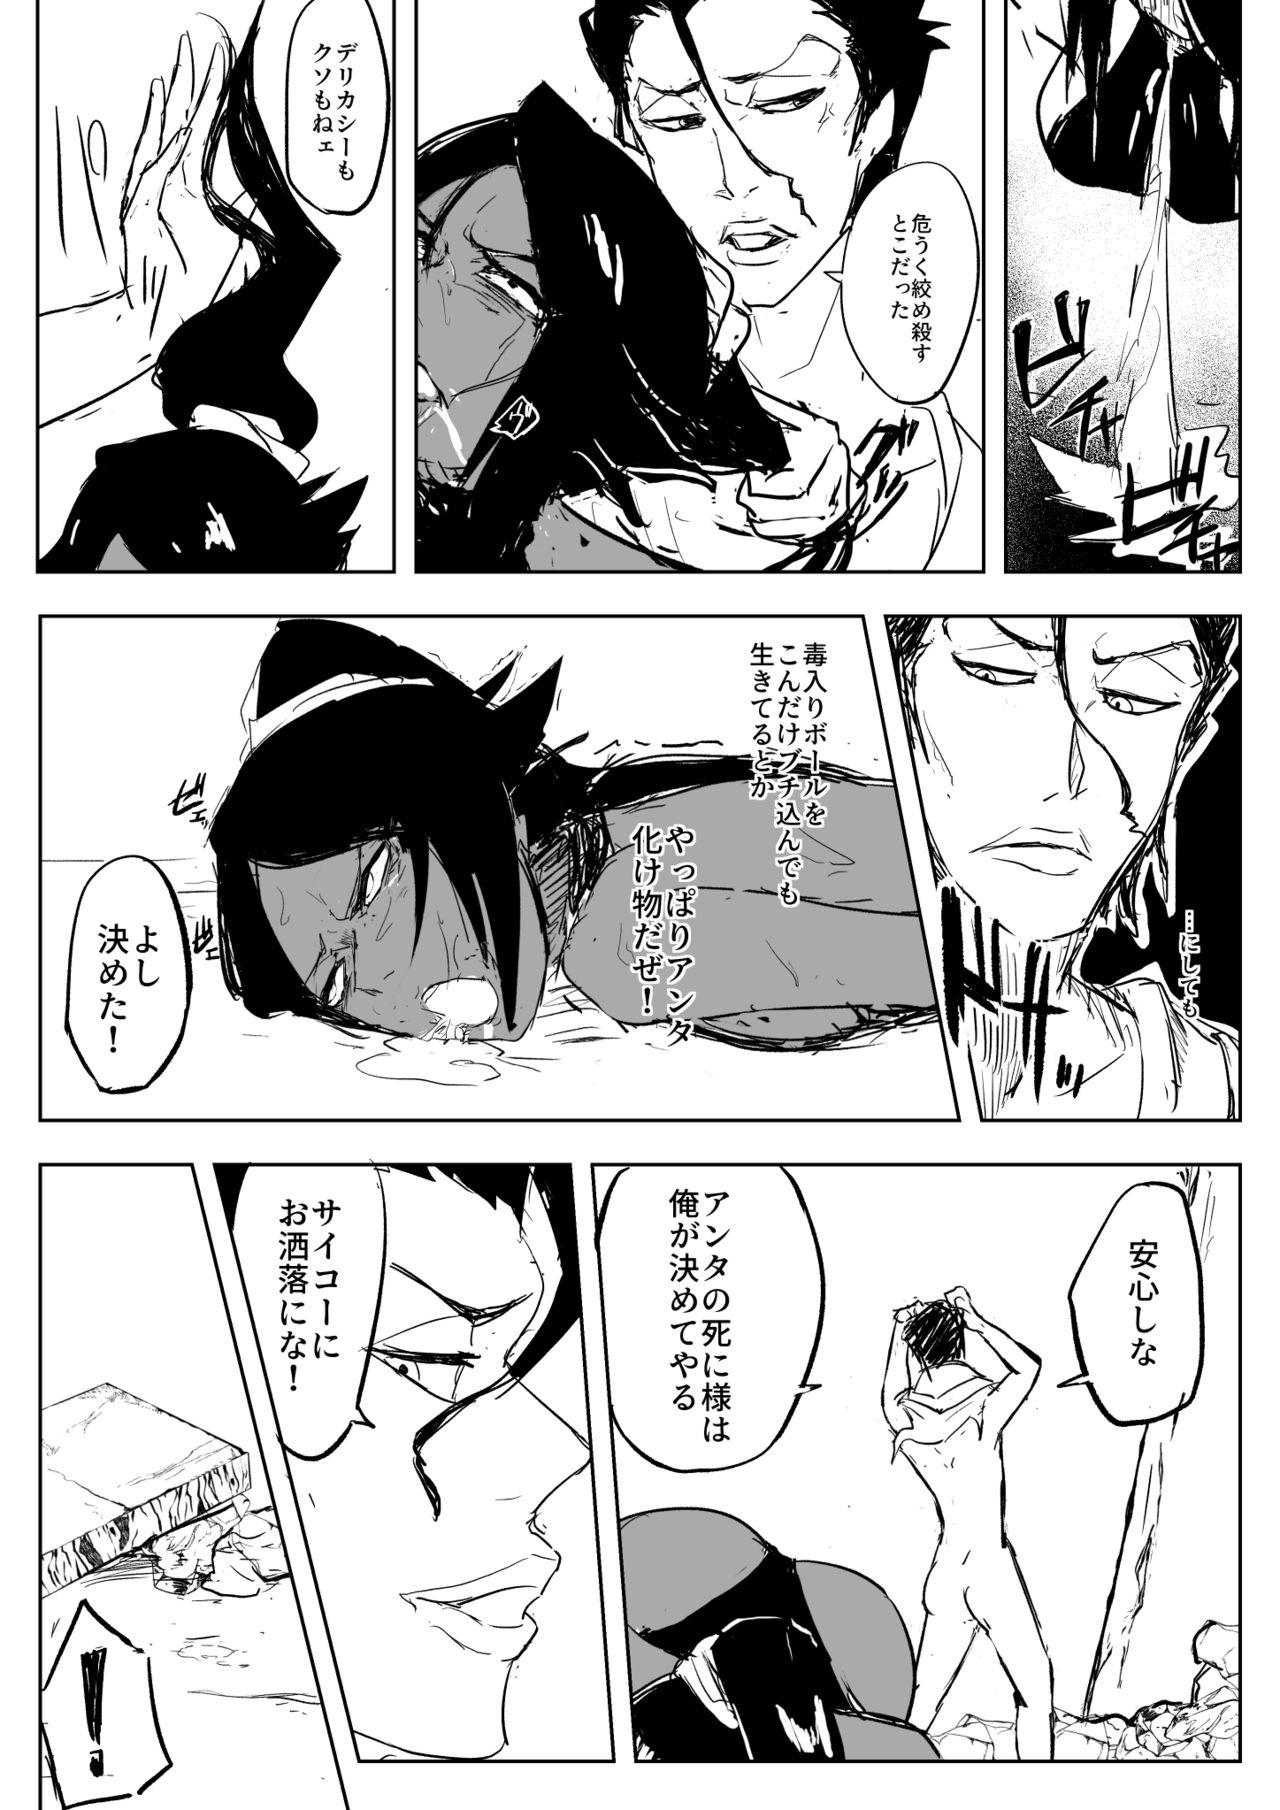 Yoruichi vs Nakk Le Vaar 2